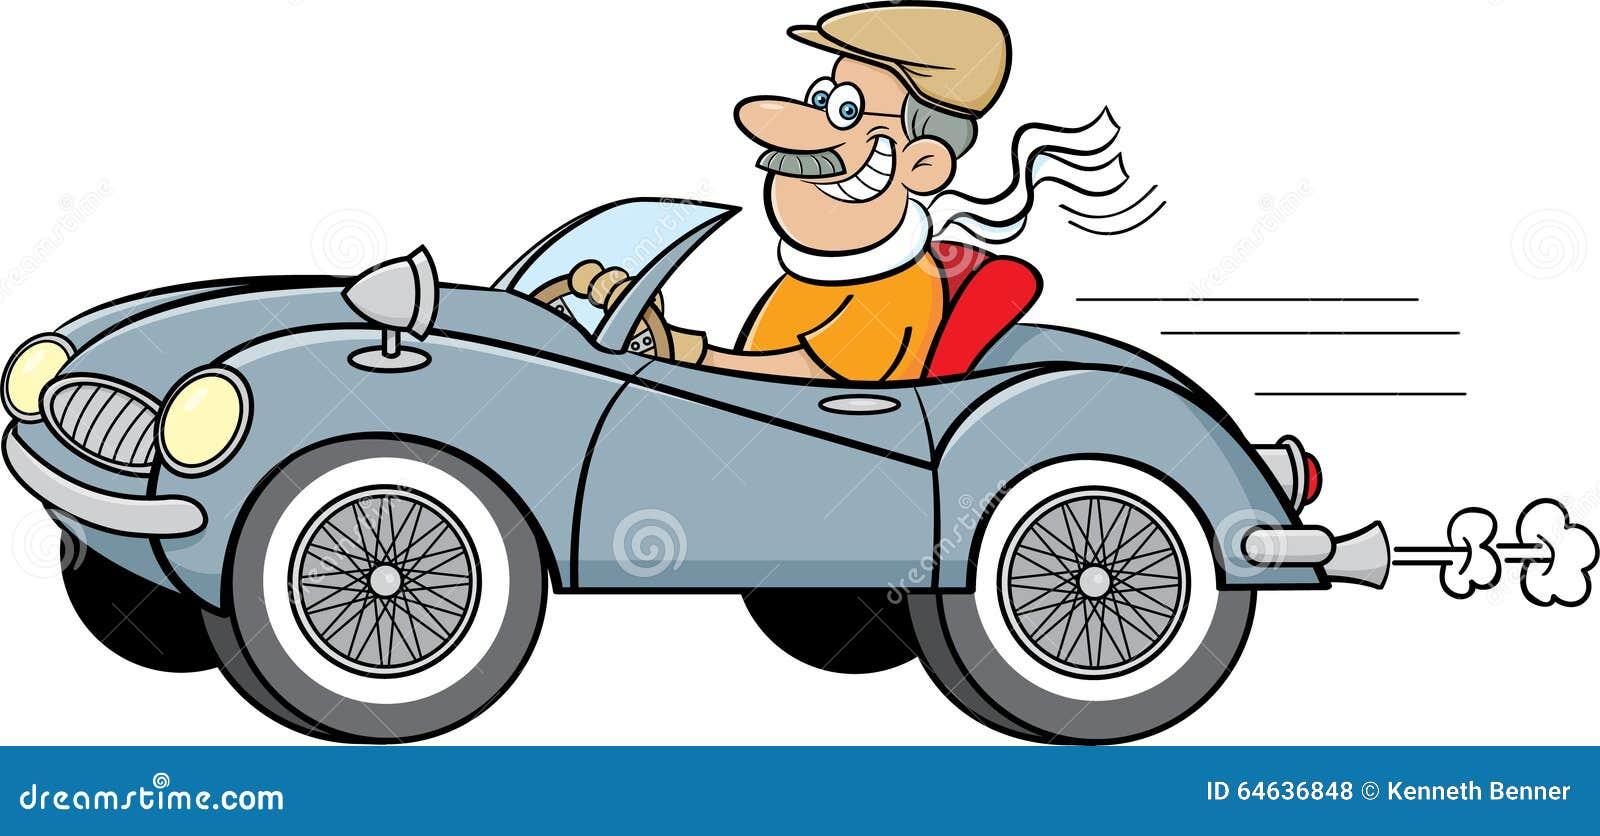 Cartoon Man Driving A Sports Car Stock Vector Image 64636848